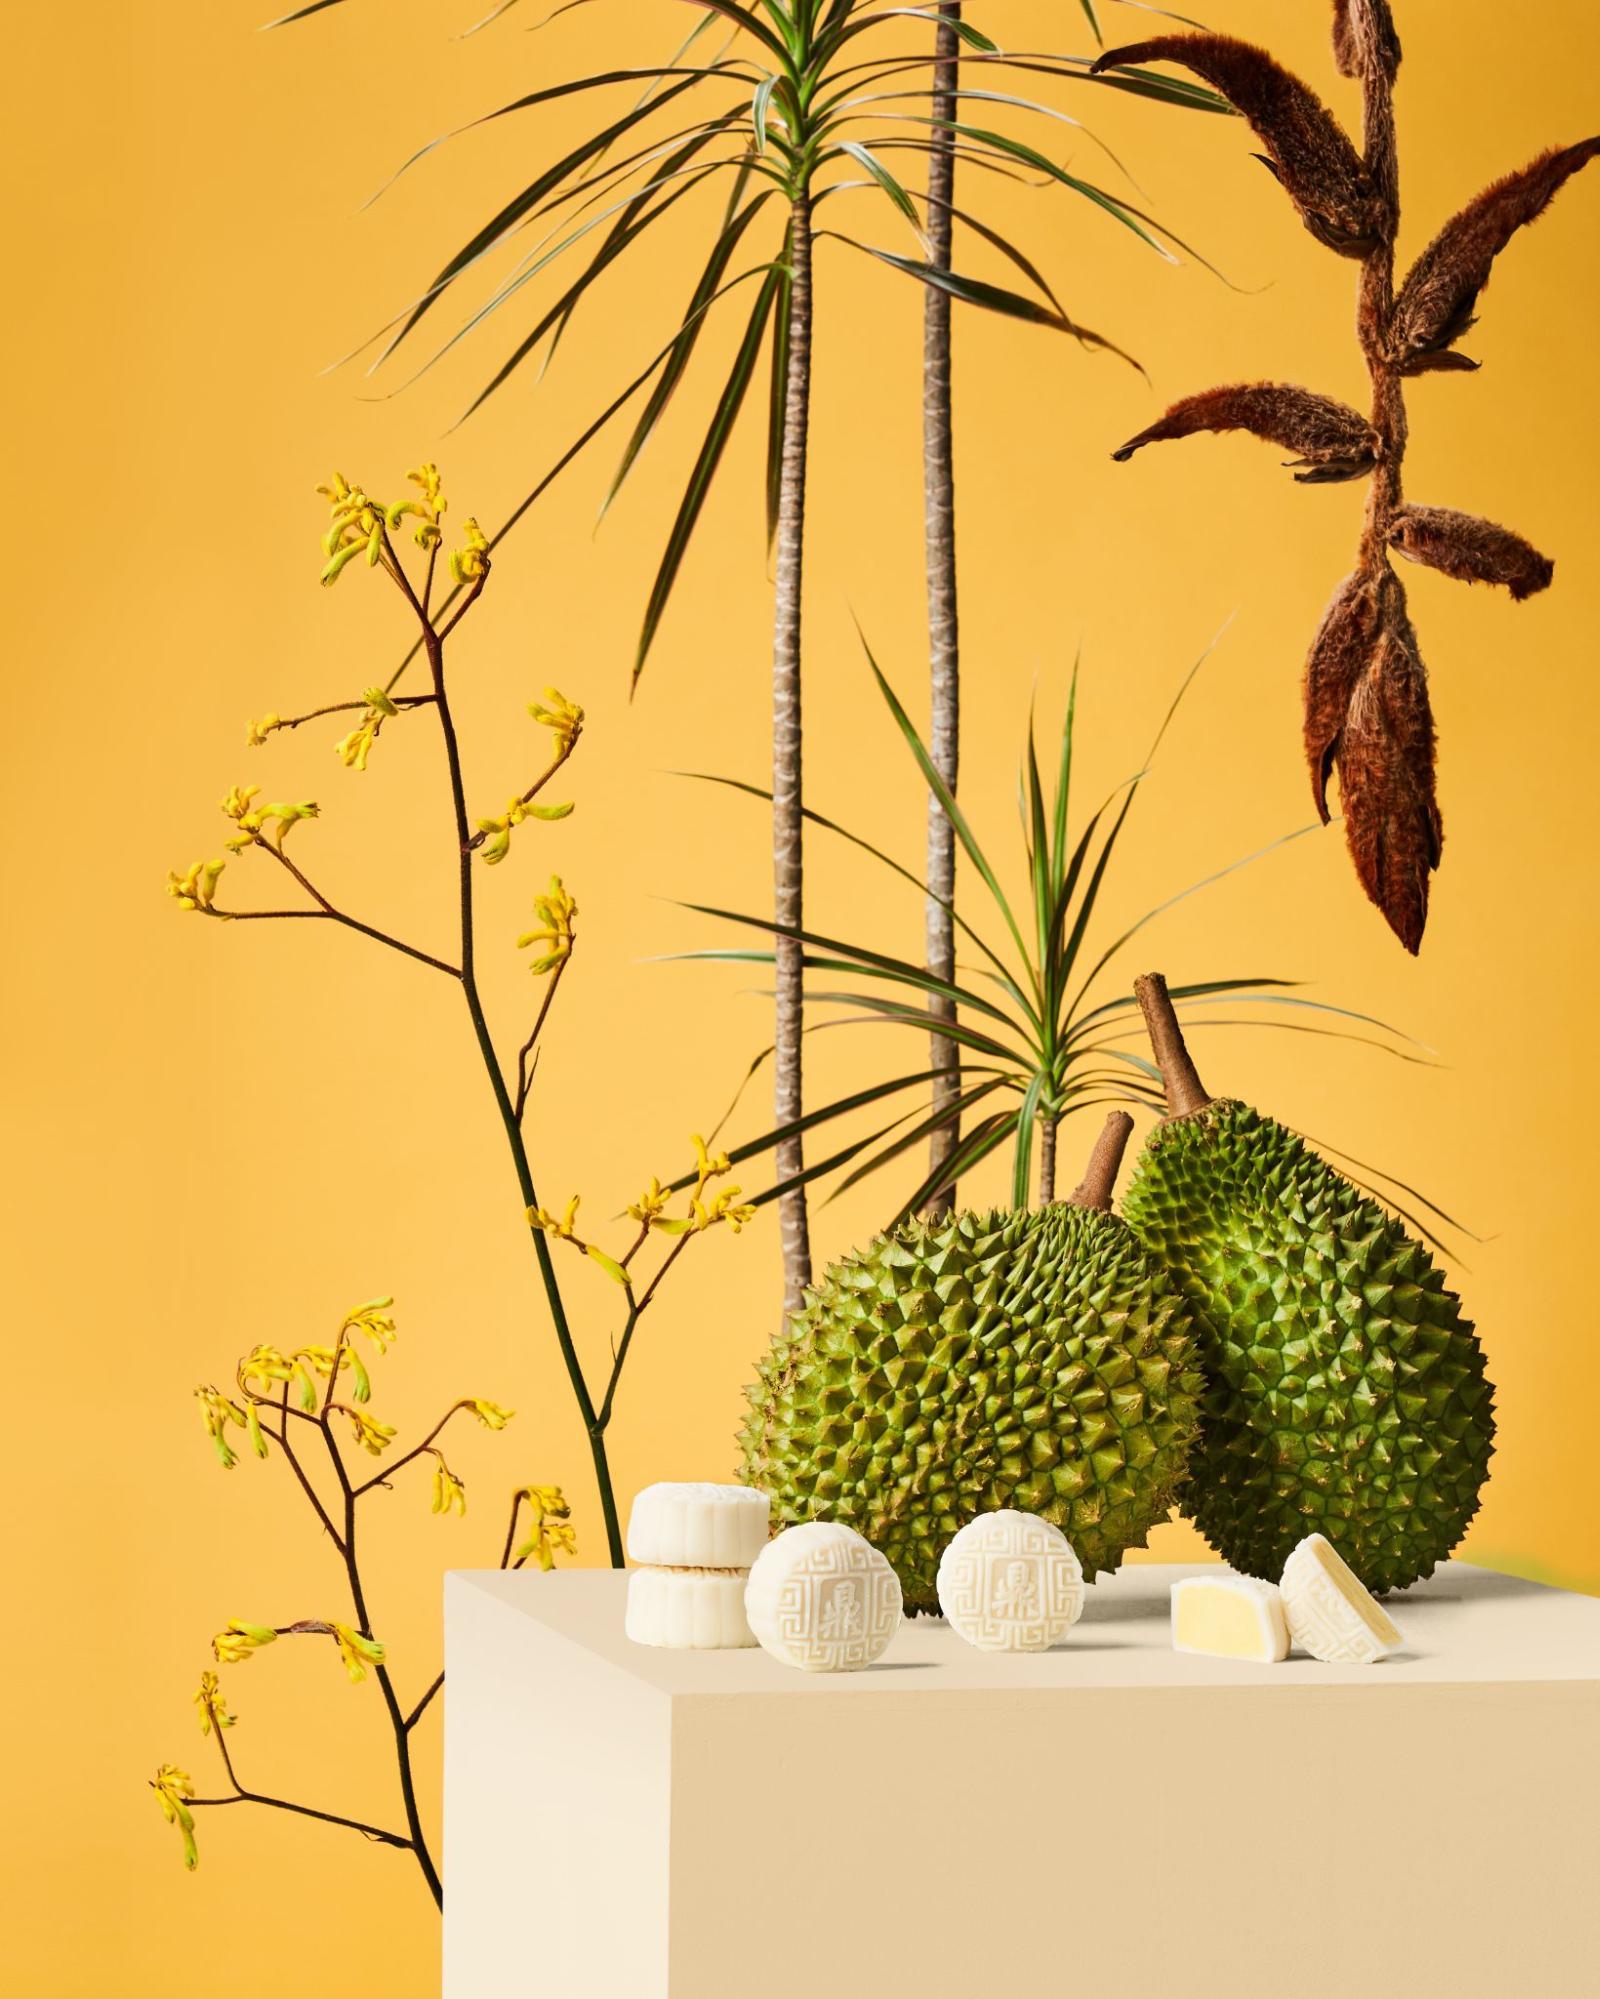 Mooncake Boxes 2021 to Repurpose - Ding Mooncake Durian Snowskin